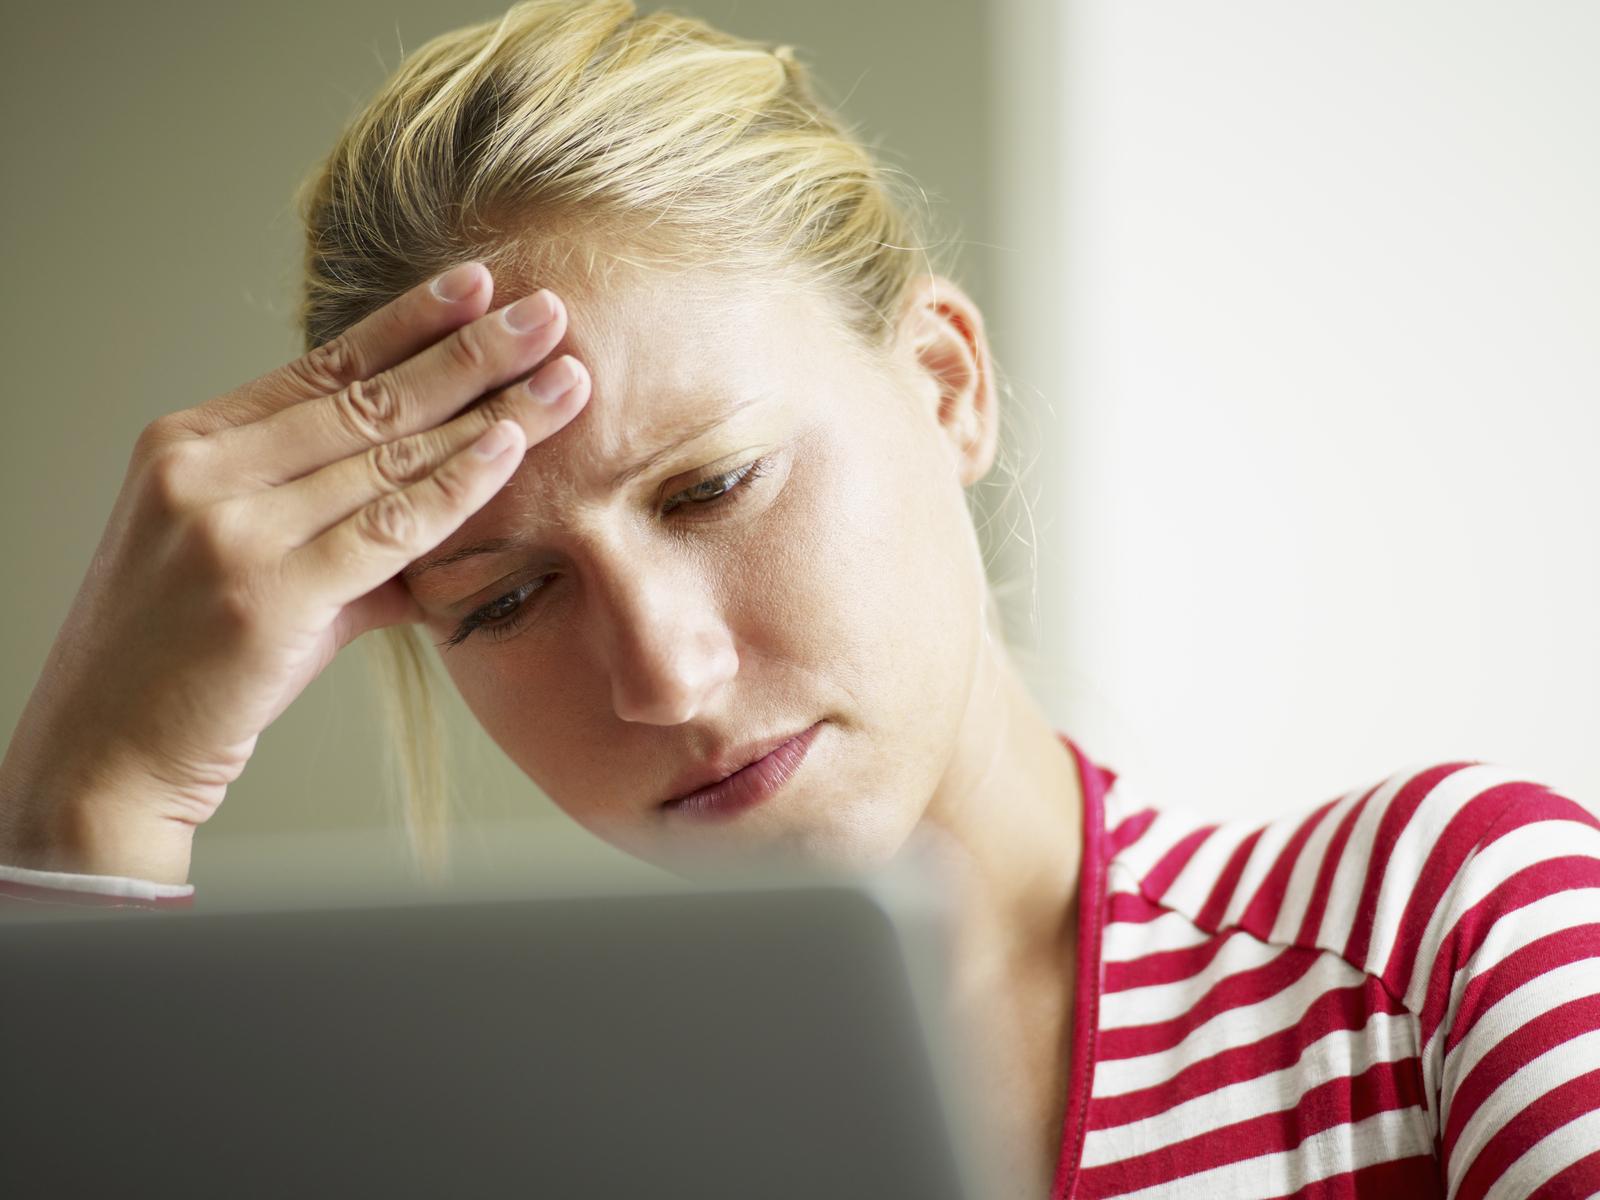 female face palm computer image